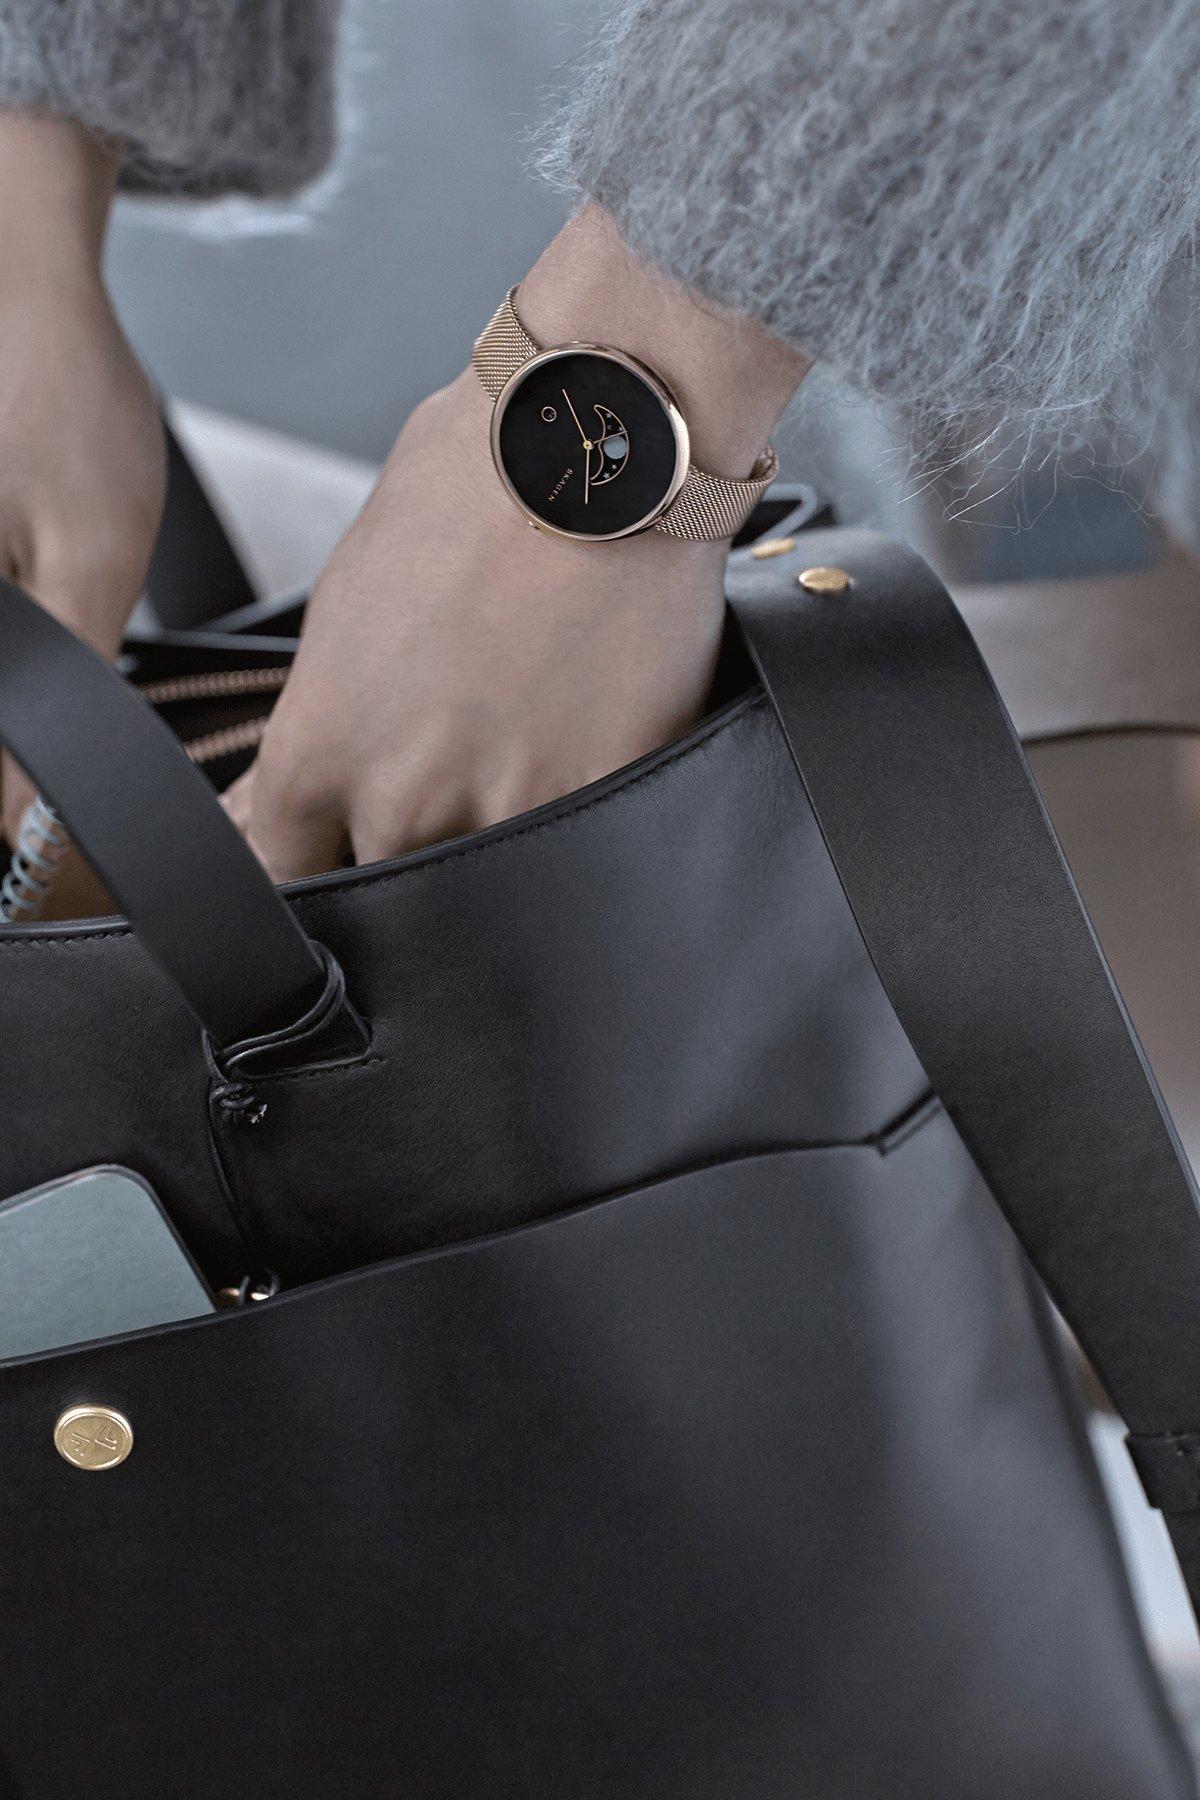 Modny zegarek Skagen